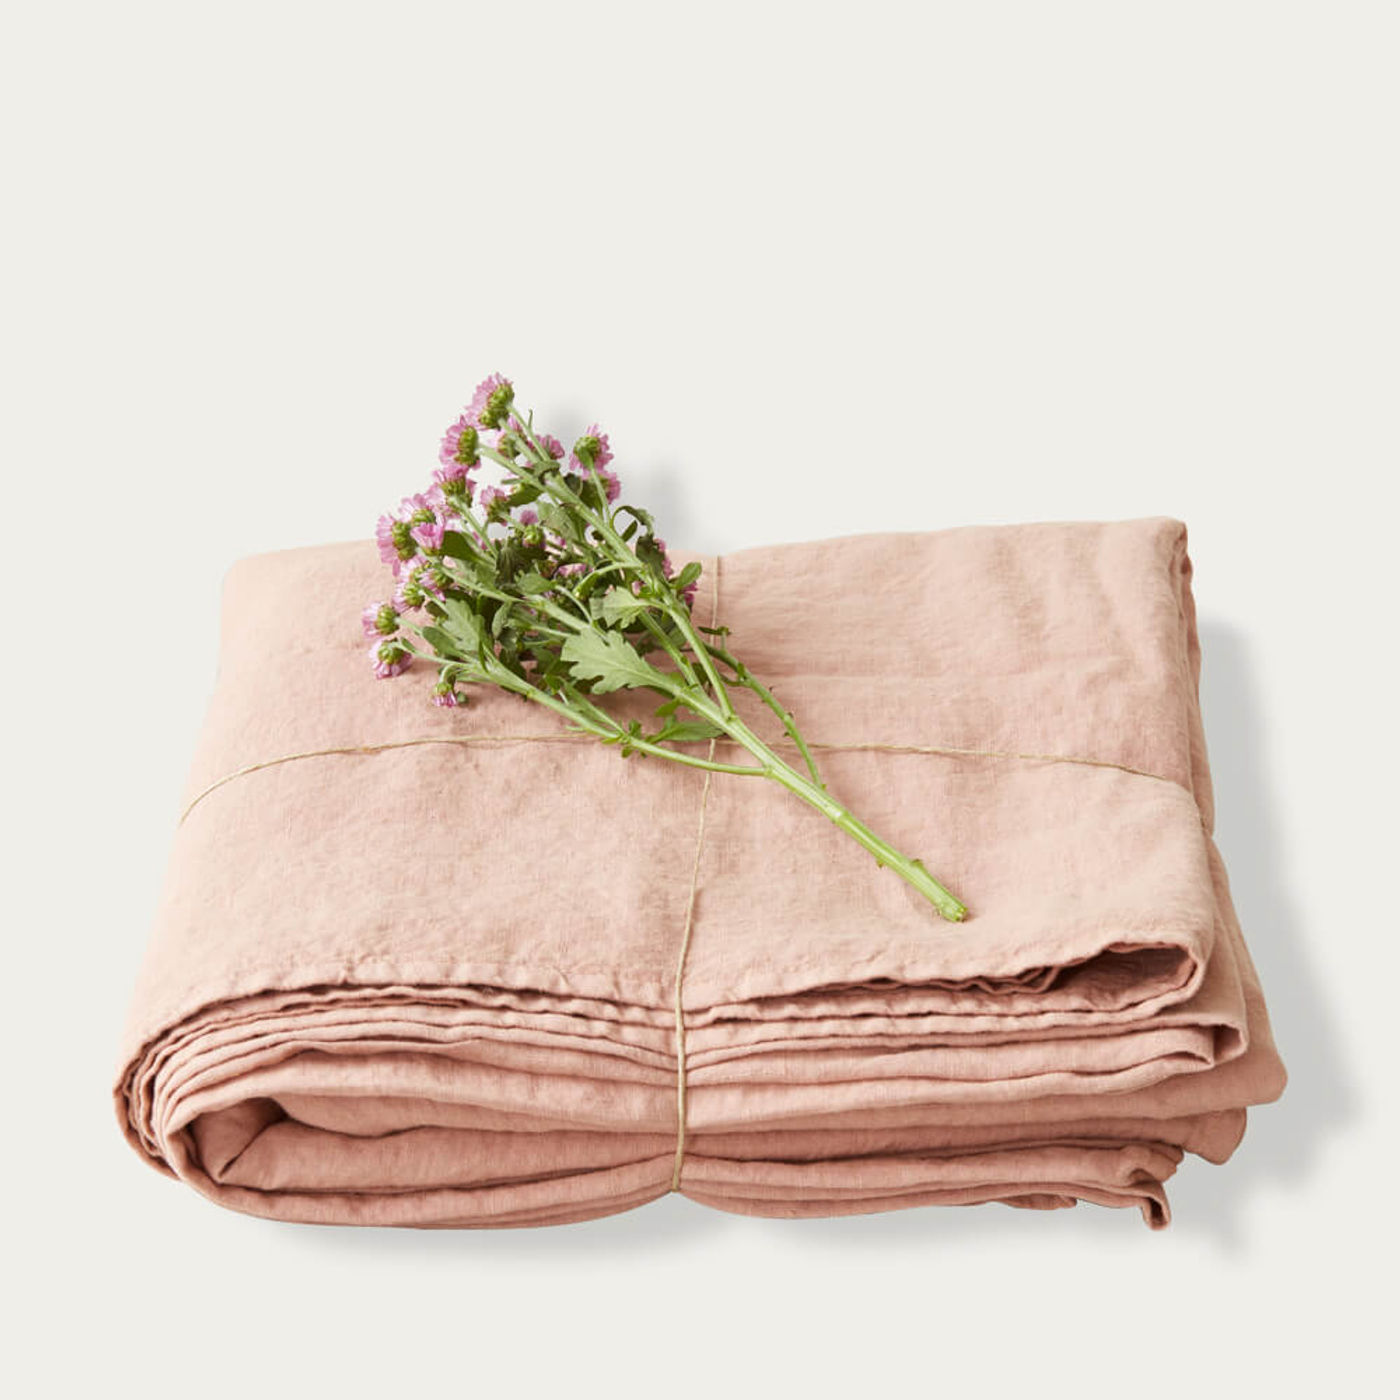 Cafe Creme Washed Linen Bed Set | Bombinate